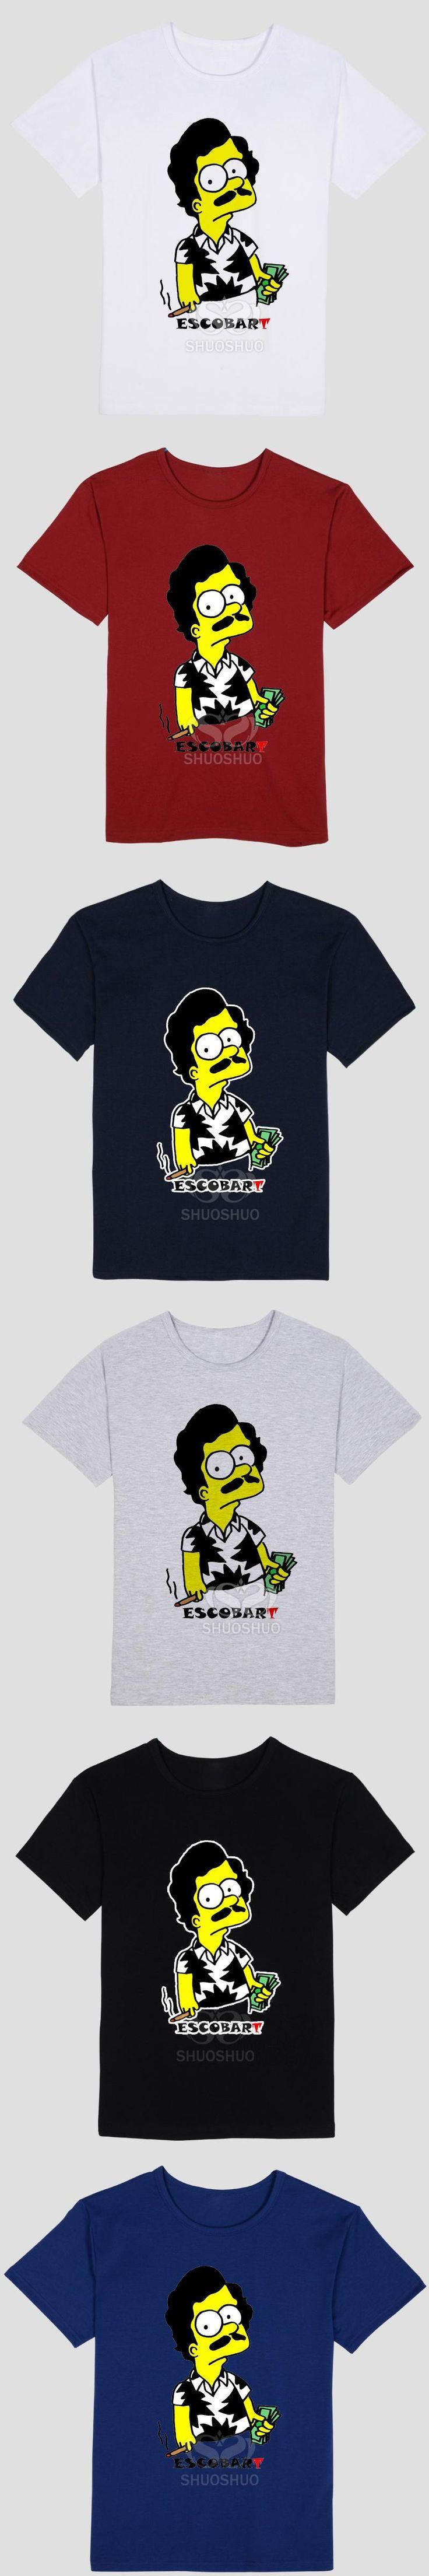 PABLO ESCOBAR Print Tshirt For Men Women Short Sleeve Cotton Casual color Shirt